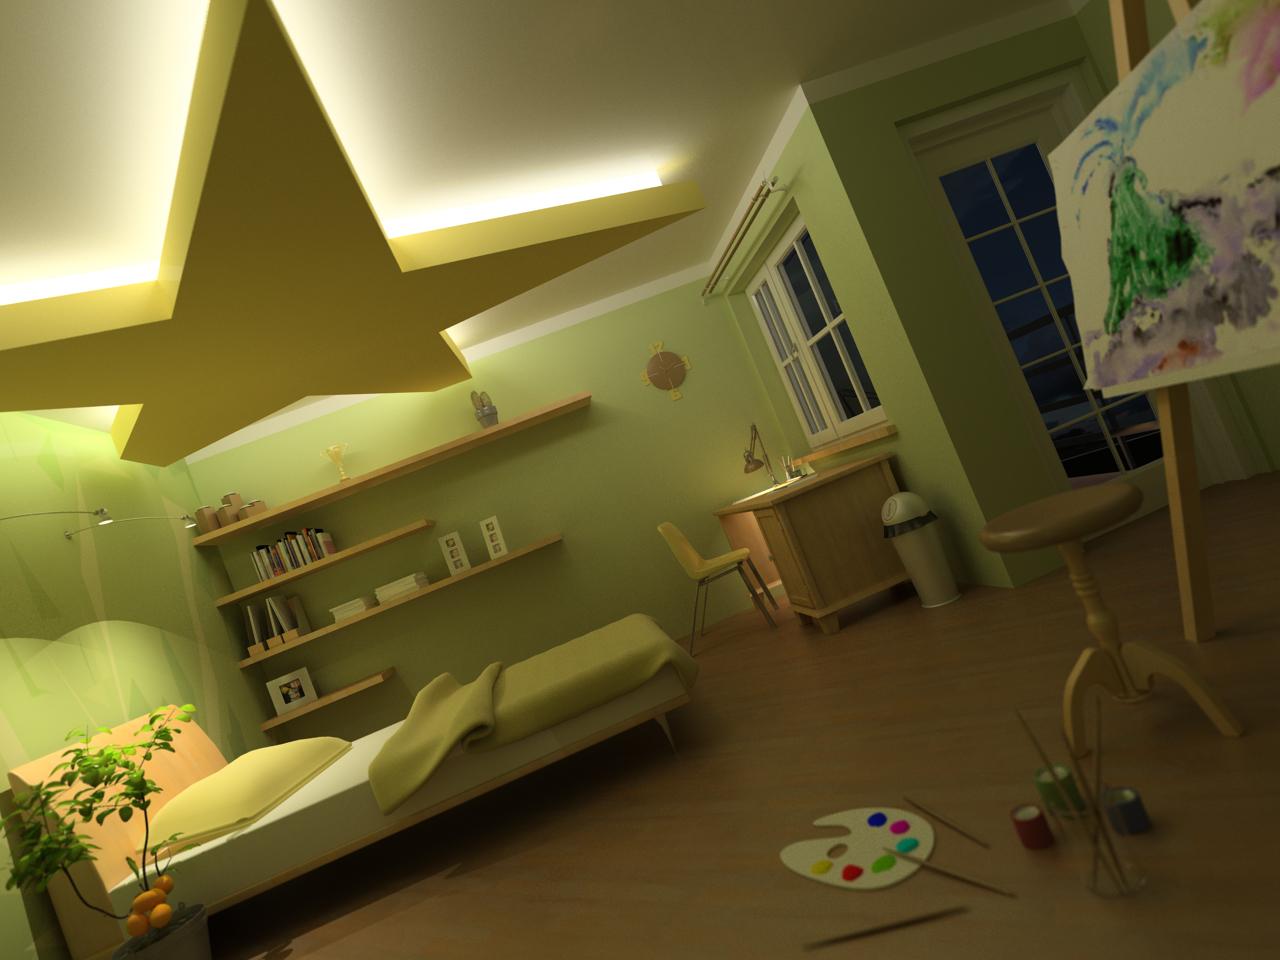 Philippine dream house design interior color design for 3d room color design